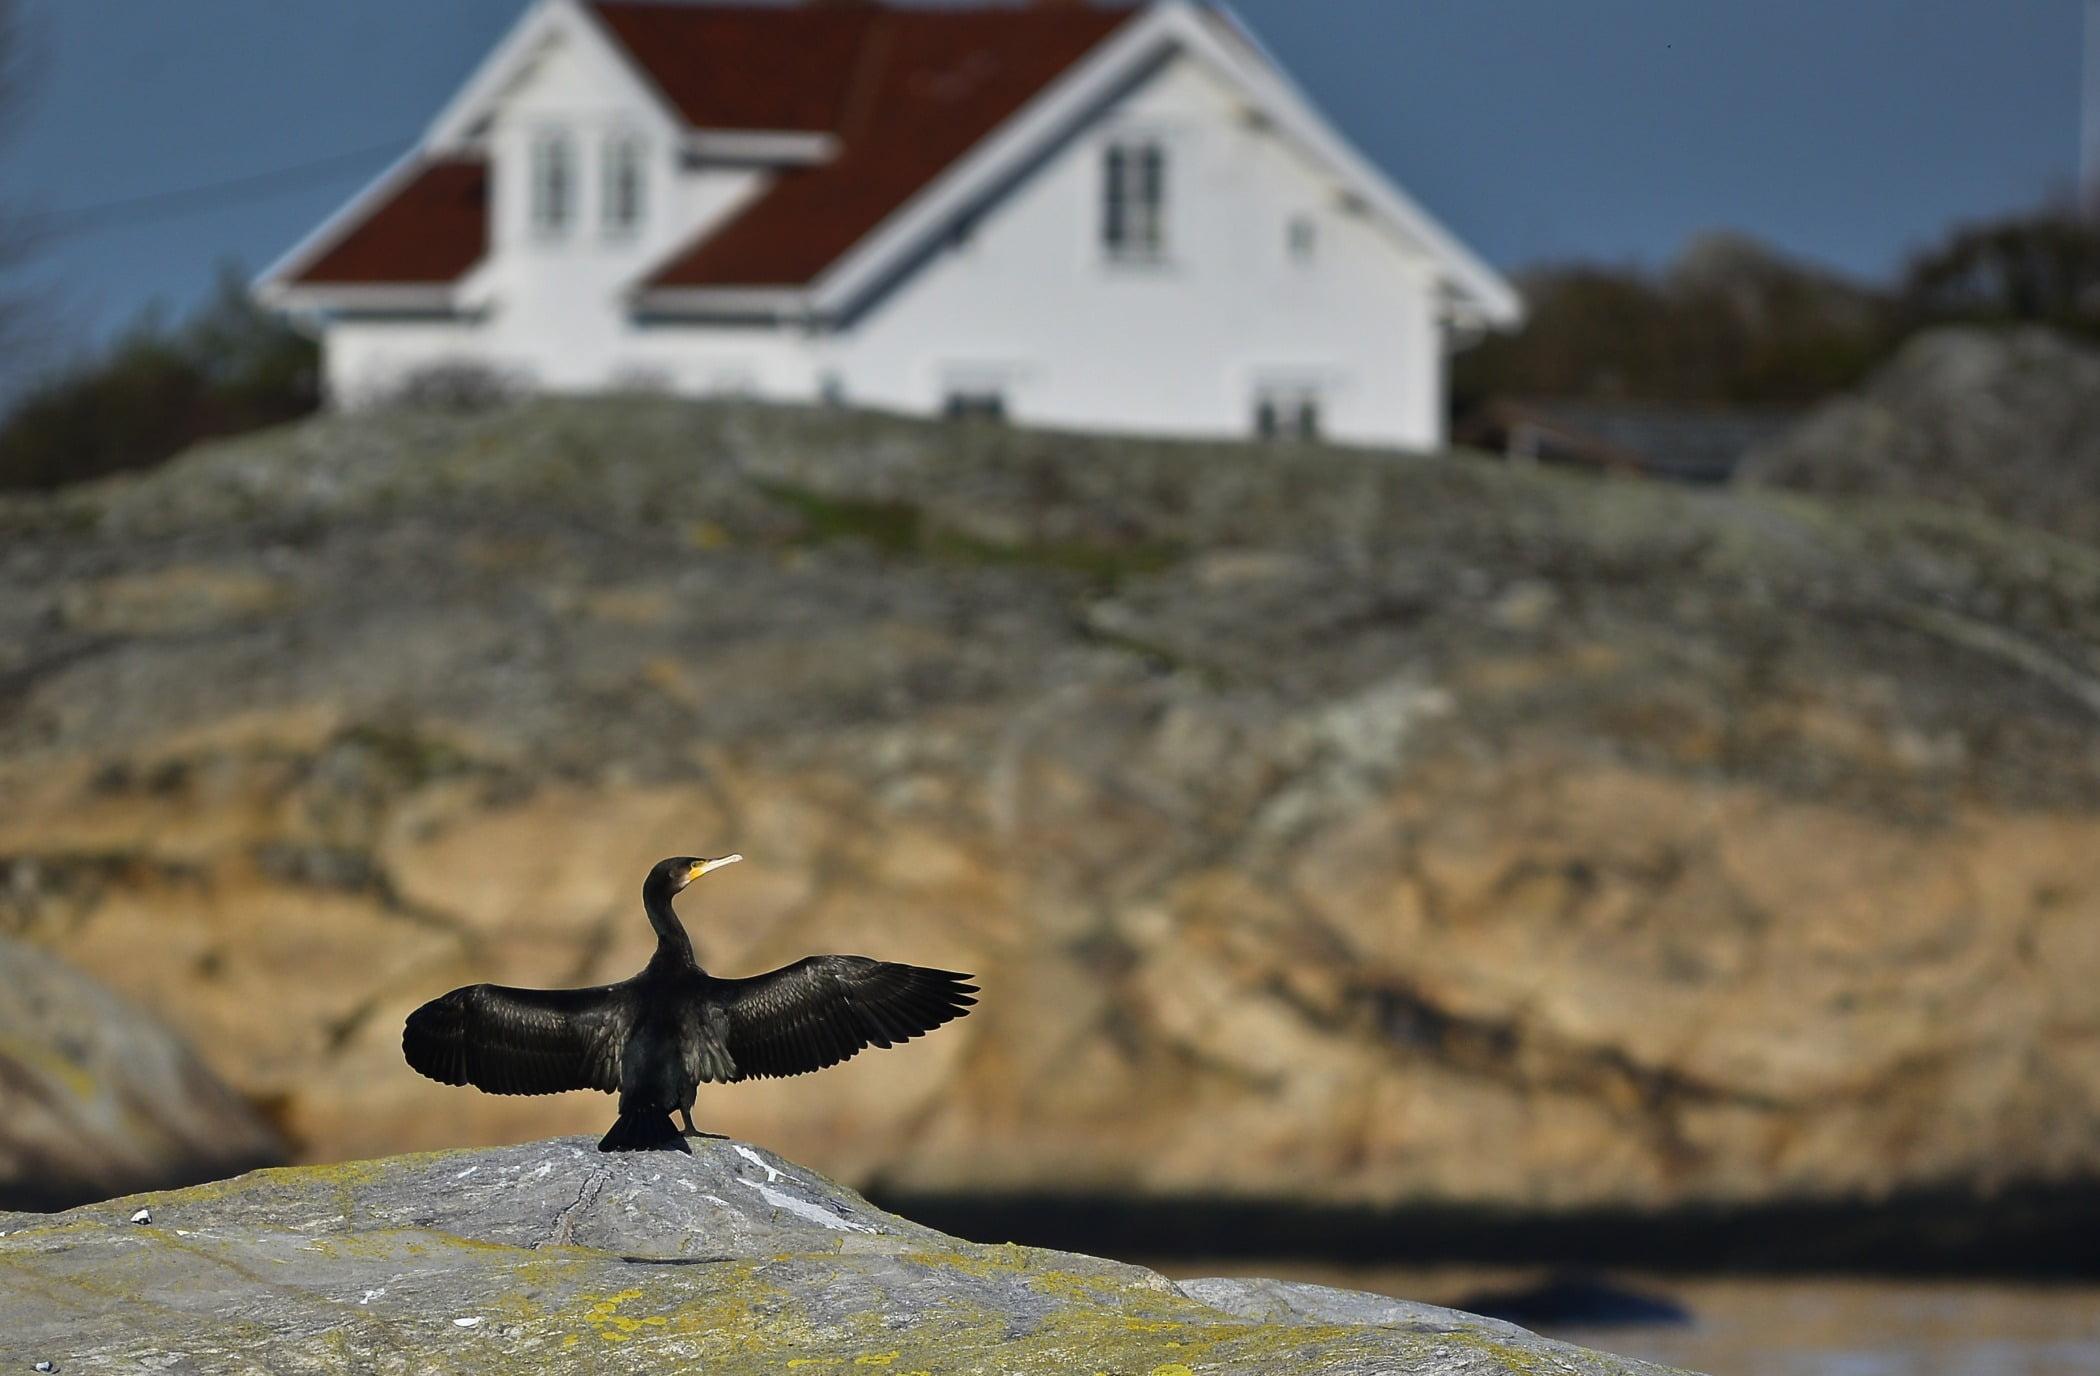 Bird, Beak, Cormorant, Sky, Wood, Water, Tree, Window, Building